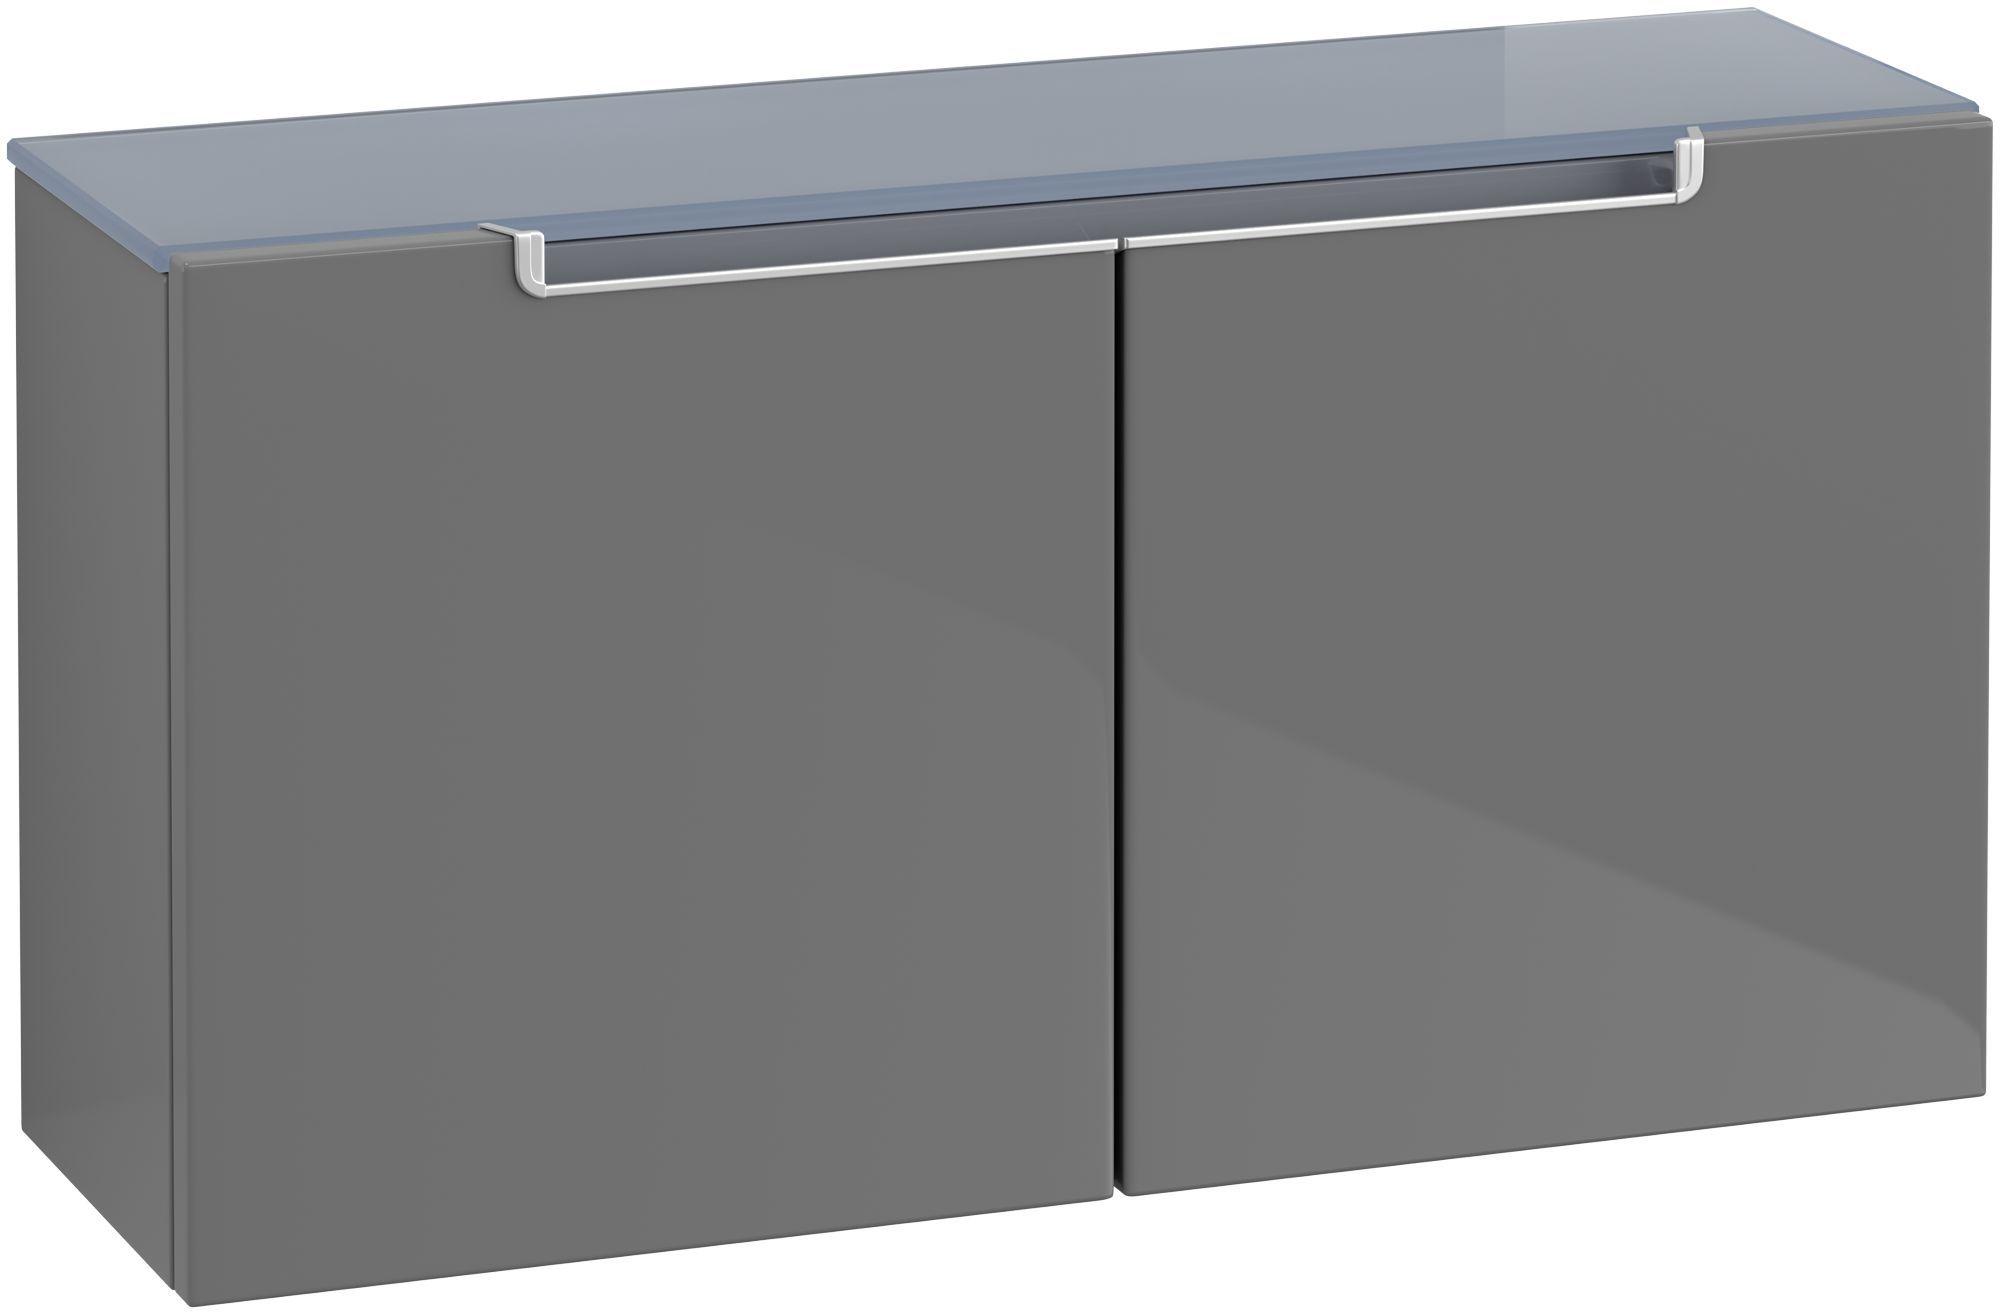 Villeroy & Boch Subway 2.0 Sideboard 2 Türen B:758xT:235xH:400mm glossy grey Griffe silberfarbig matt A7040SFP